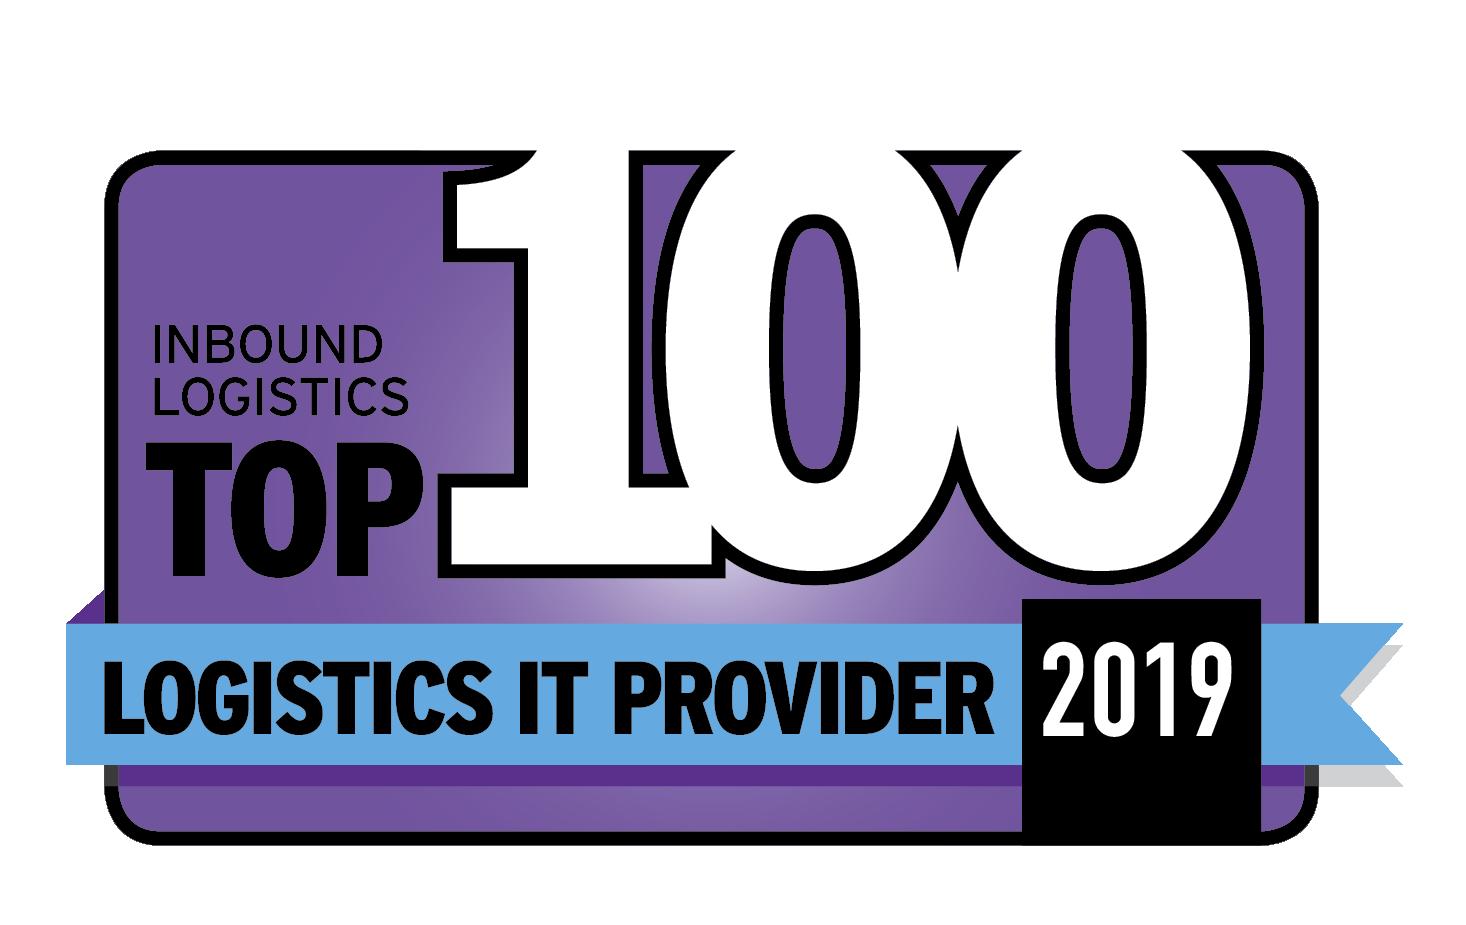 Download Top 100 LIT Logos - Inbound Logistics